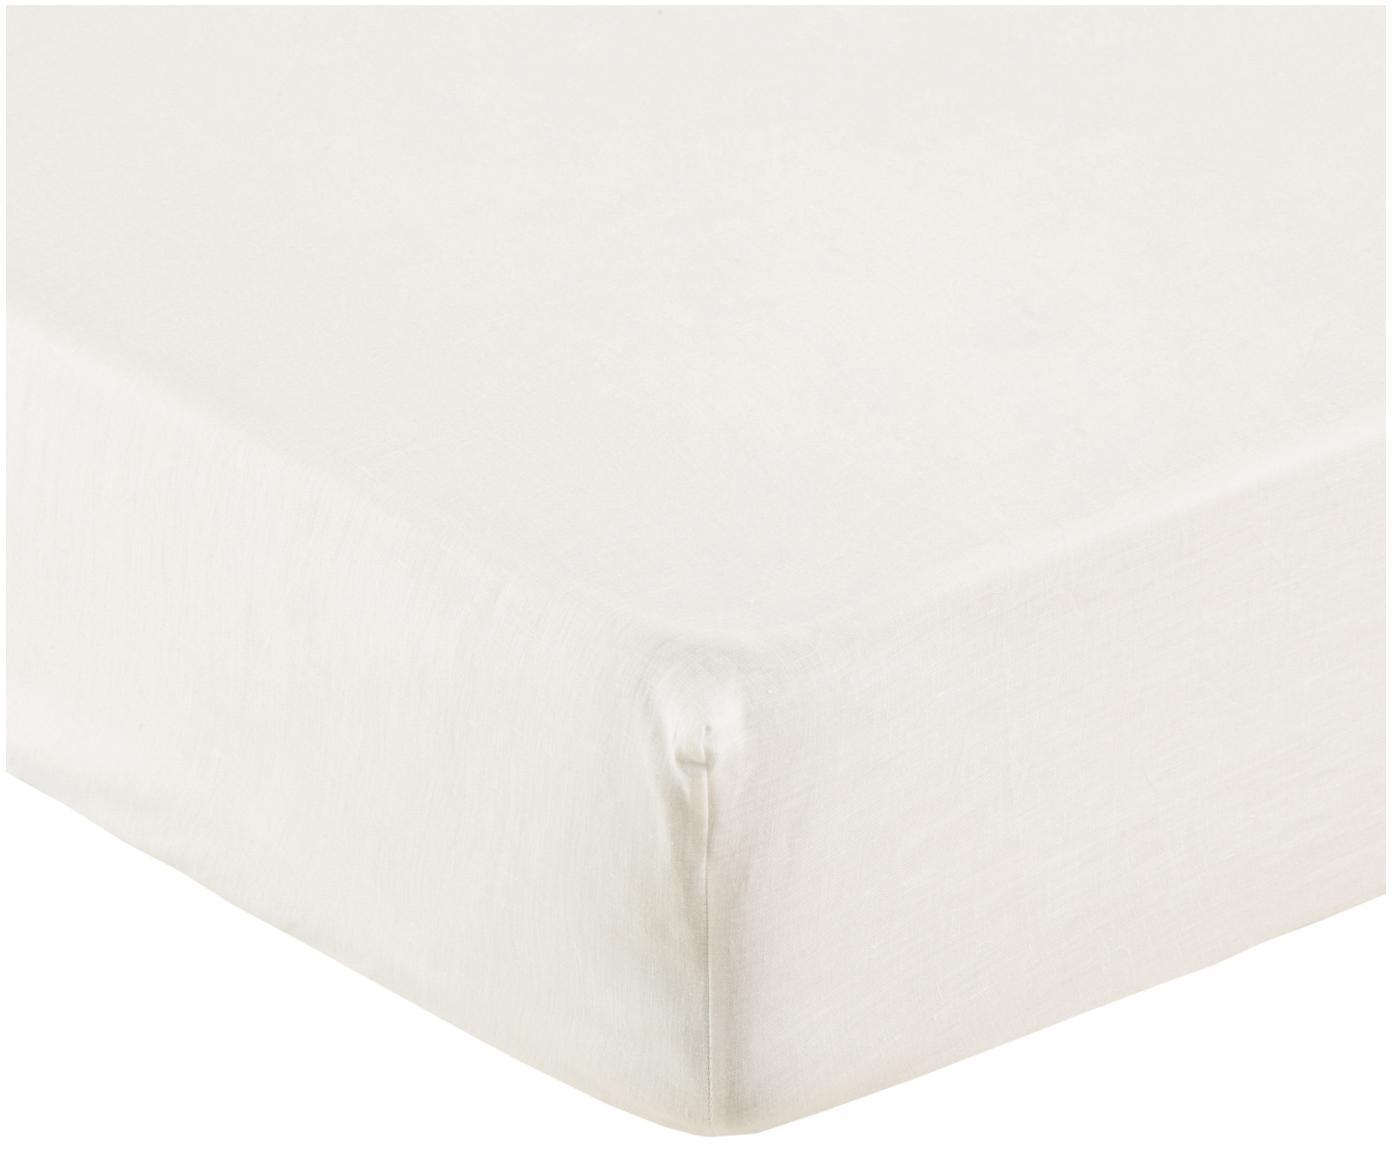 Lenzuolo con angoli in lino Soffio, Crema, Larg. 180 x Lung. 200 cm